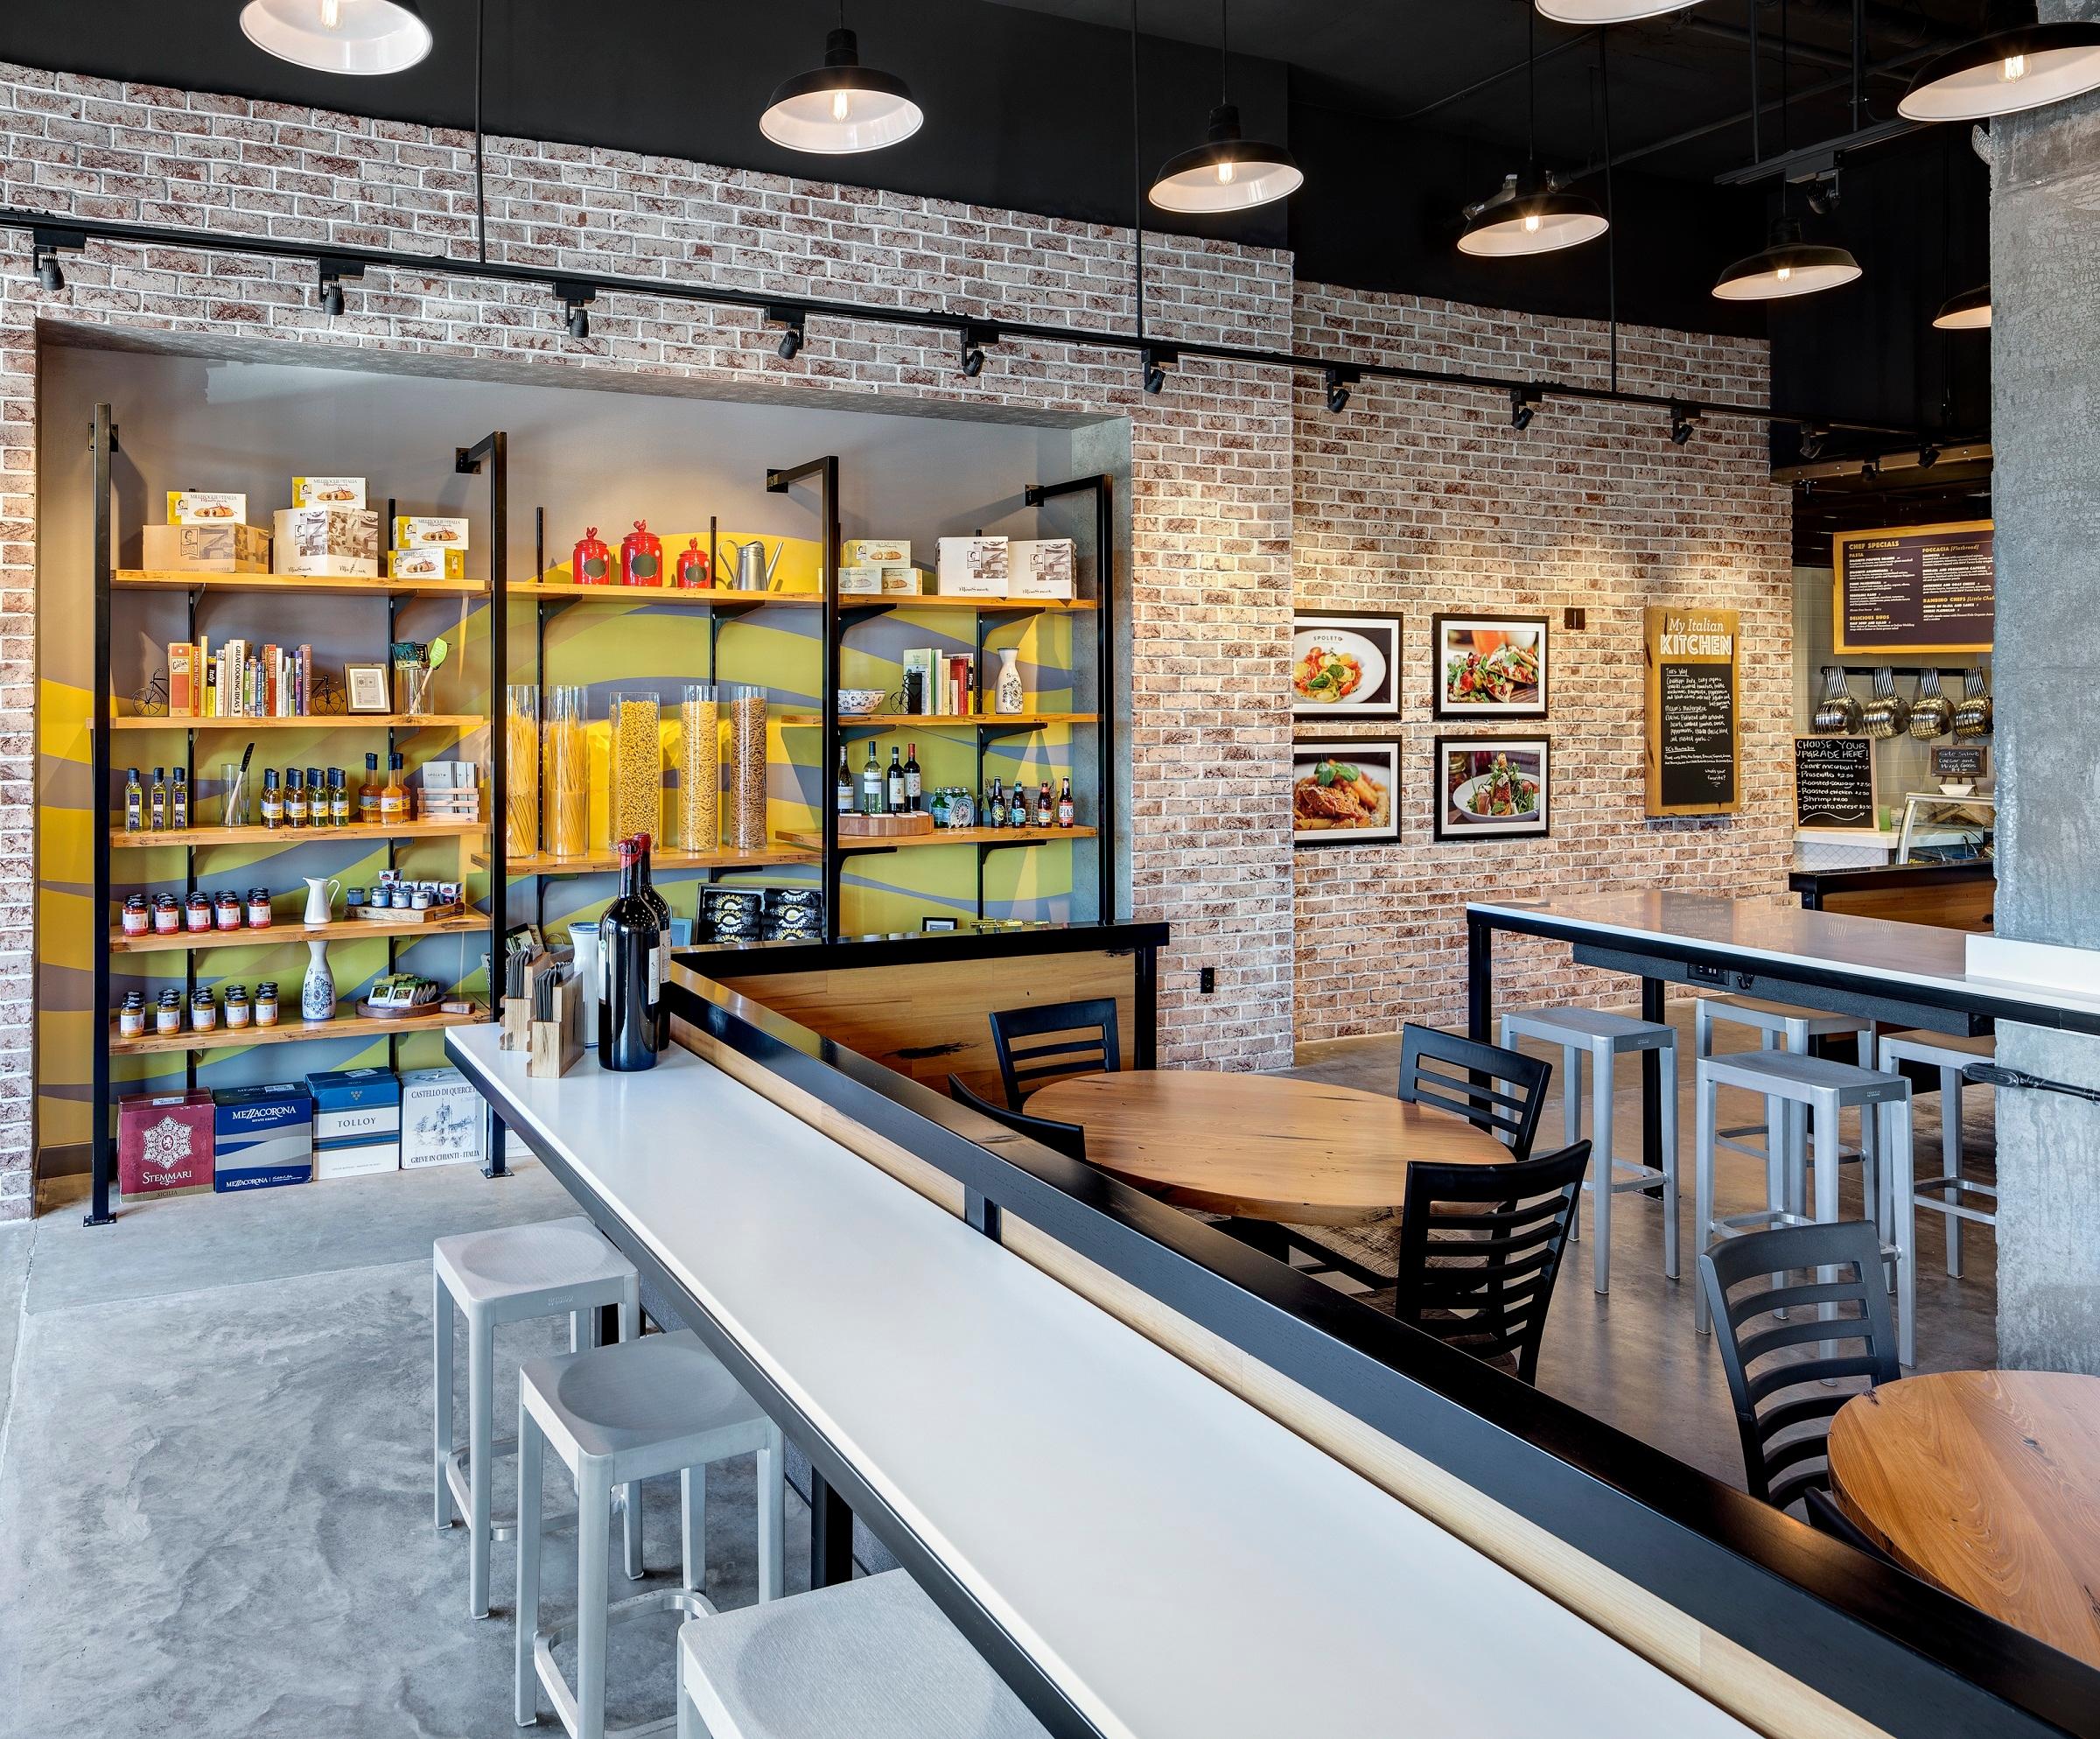 Spoleto My Italian Kitchen Florida Mall In Orlando Fl 32809